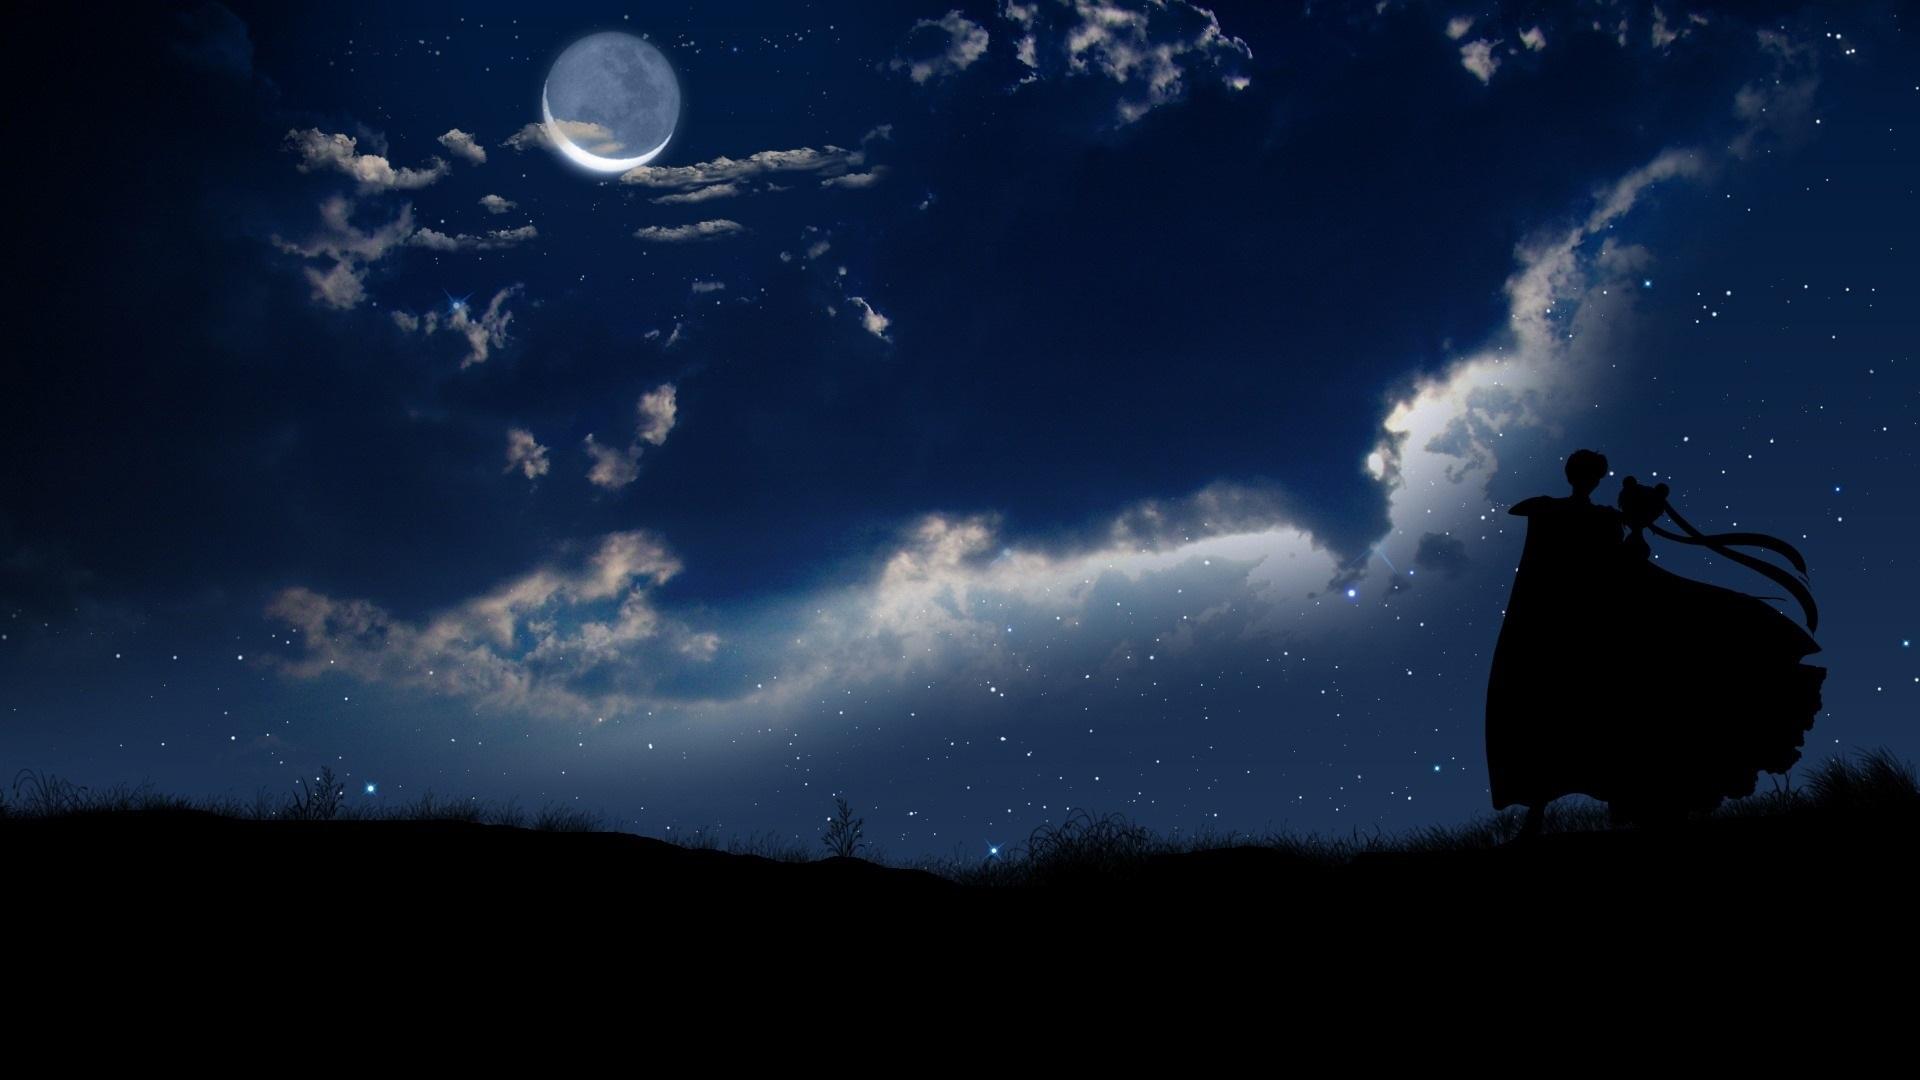 Rock Lee Wallpaper 3d Moon Backgrounds Free Download Pixelstalk Net